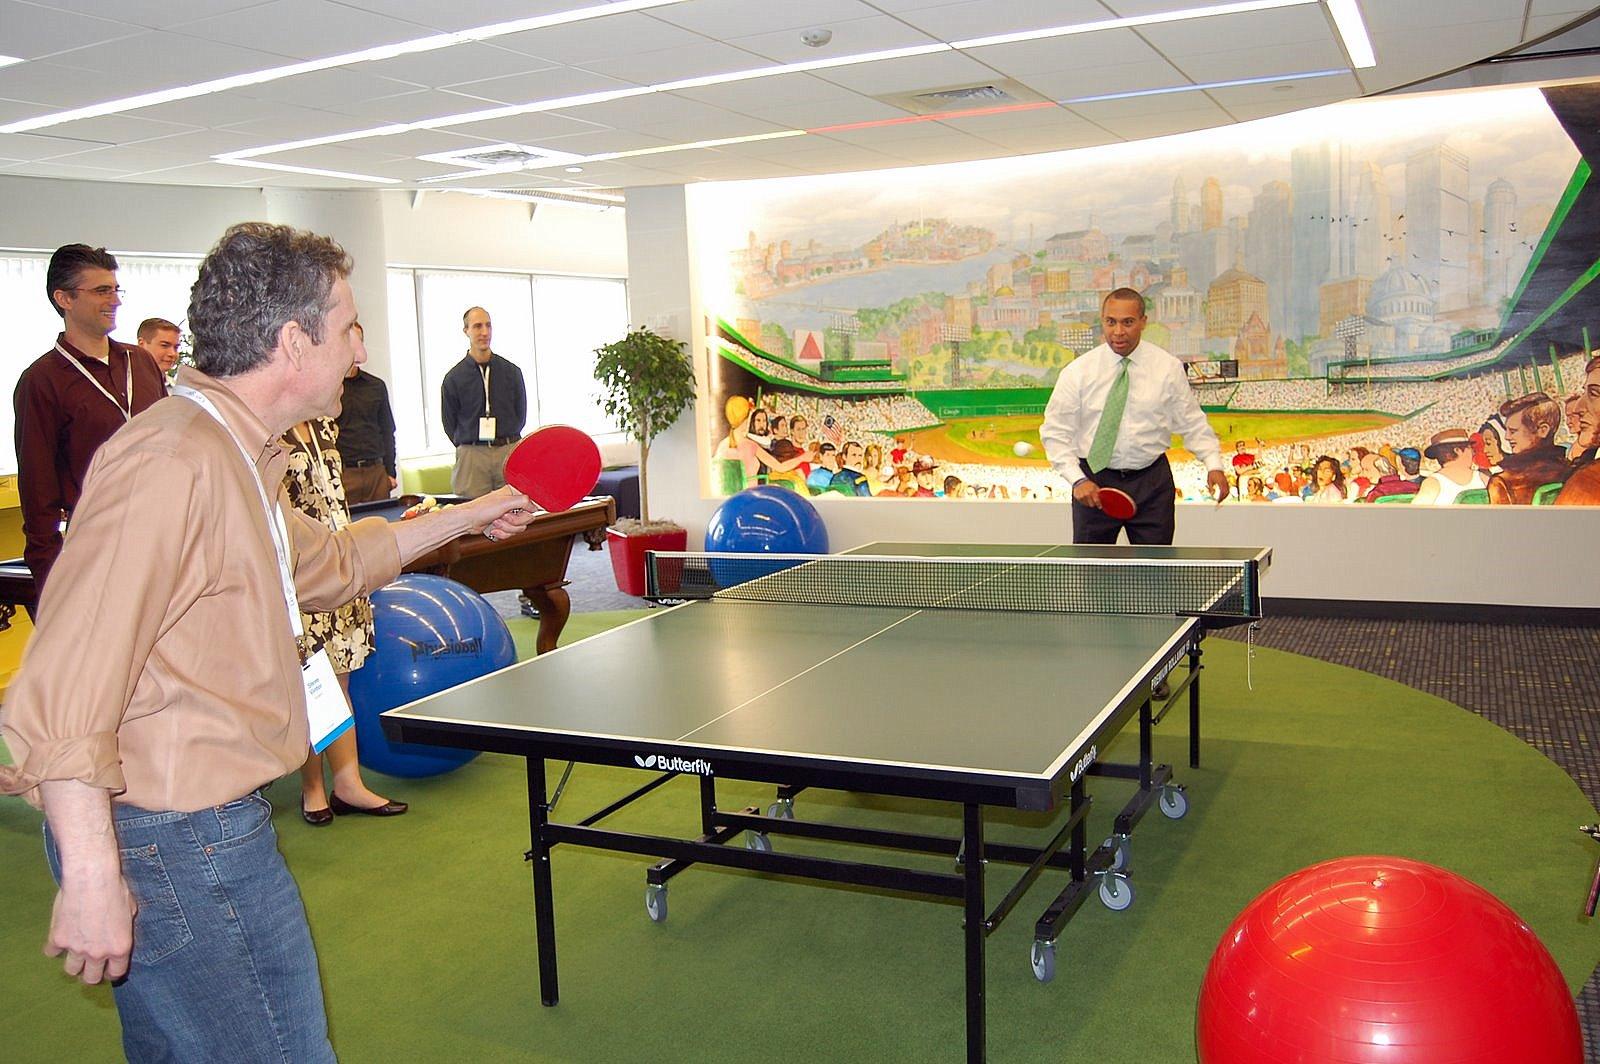 Steve_Vinter_and_Deval_Patrick_play_ping_pong[1]